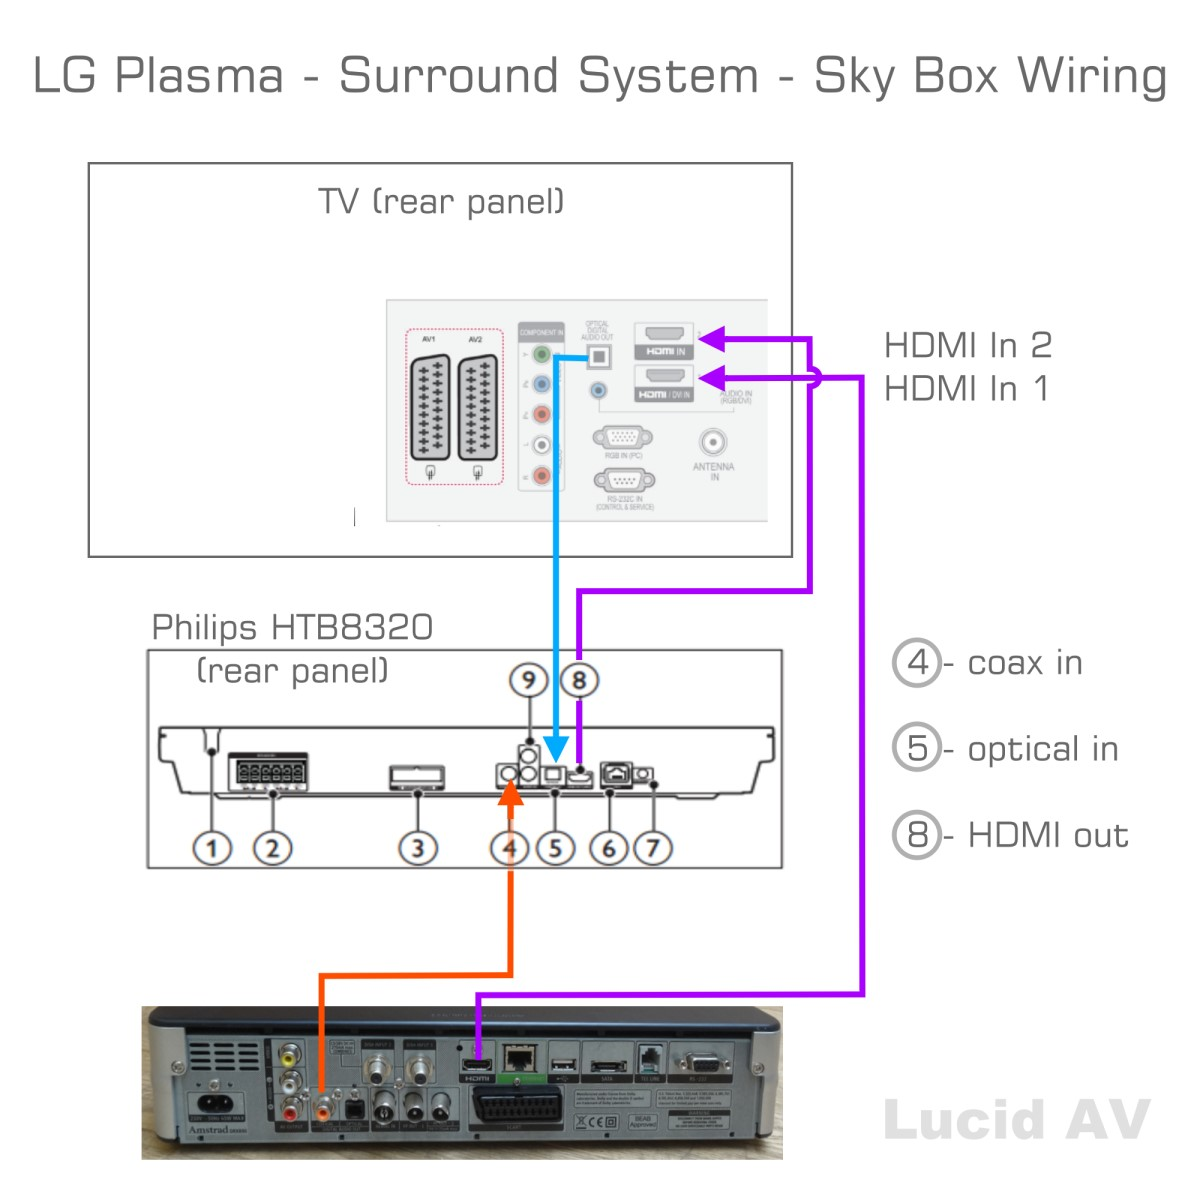 Yamaha Surround Sound Wiring Diagram Libraries For Tv Libraryhdmi Basic Guide